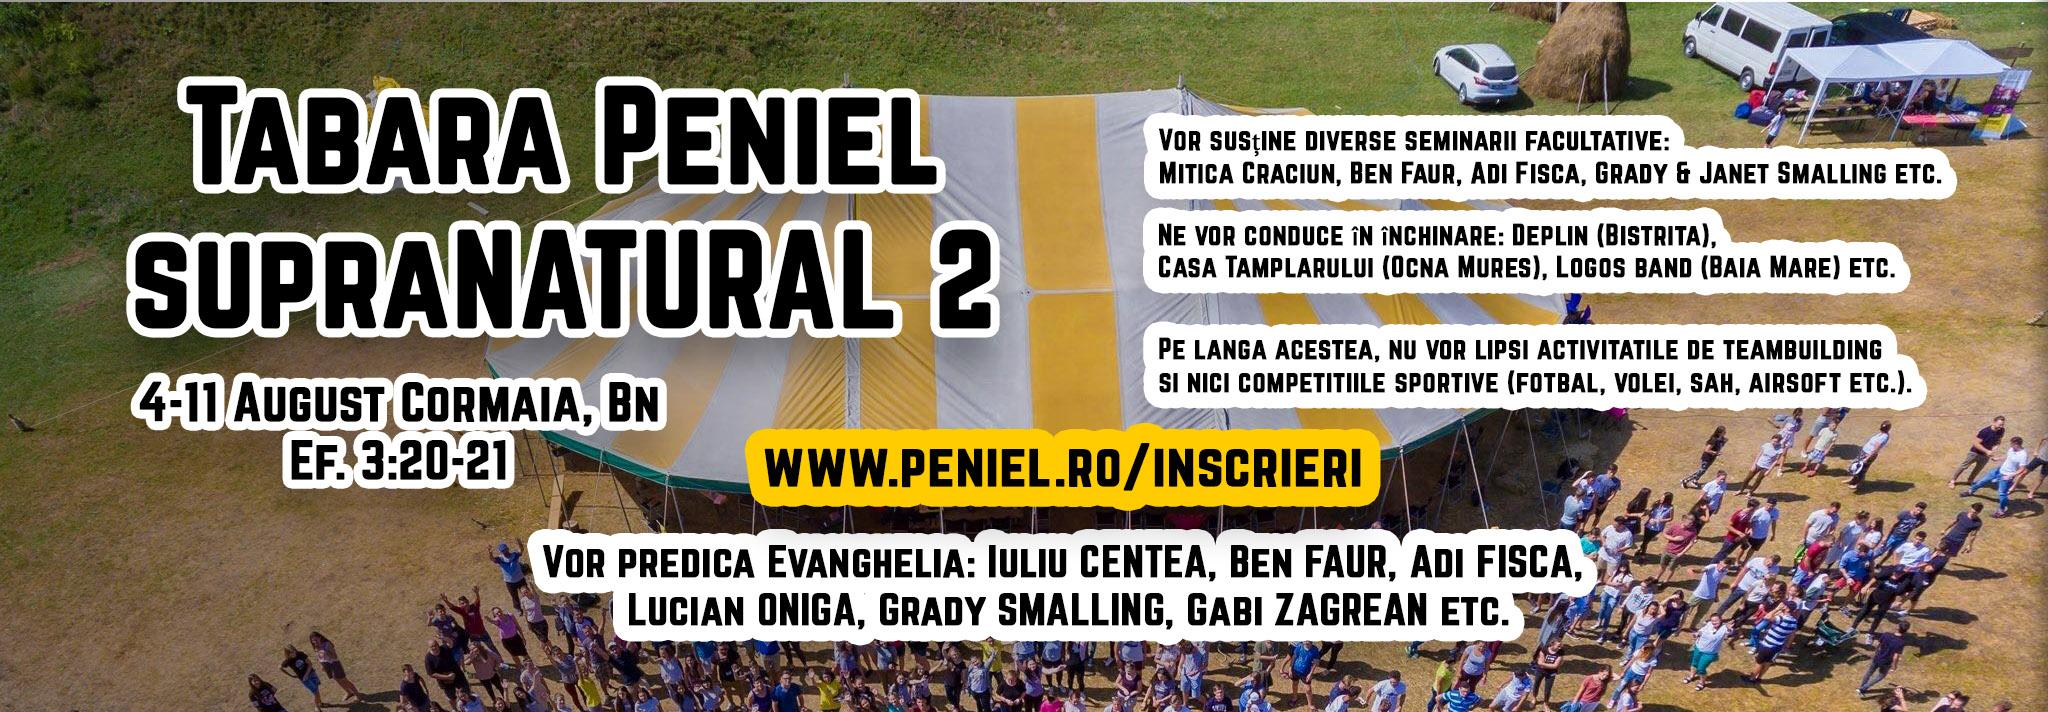 TABARA Peniel 2018 - supraNATURAL 2